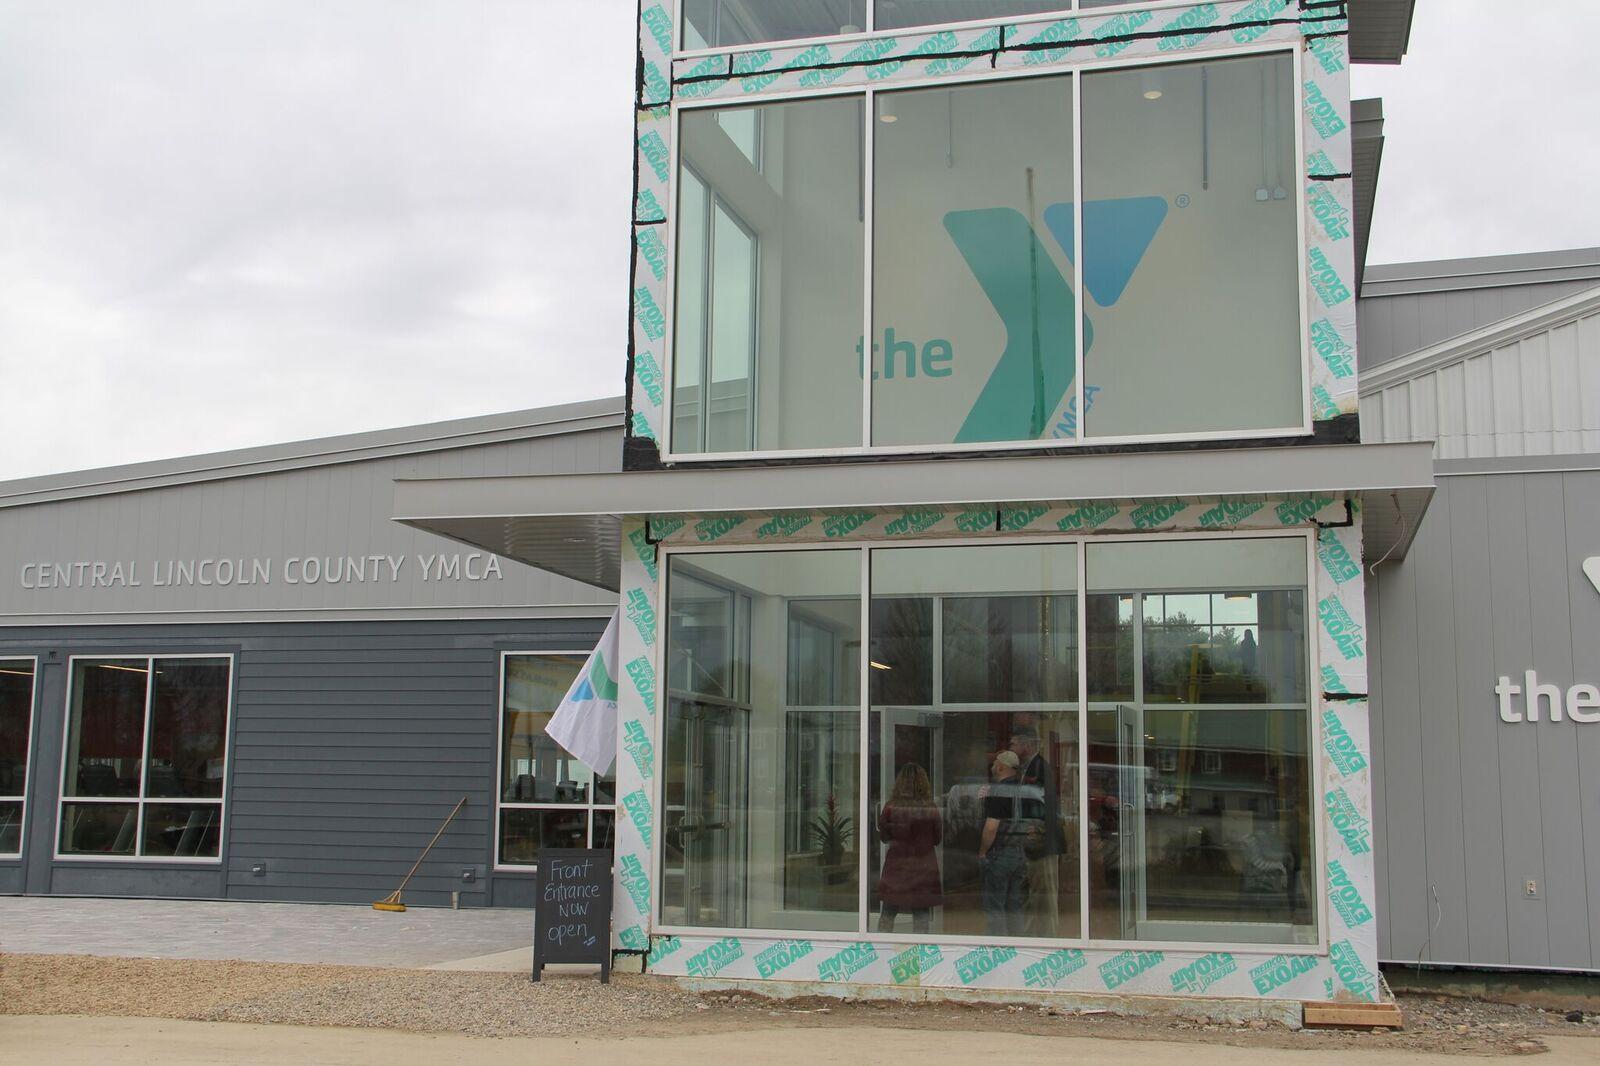 YMCA exterior.jpg